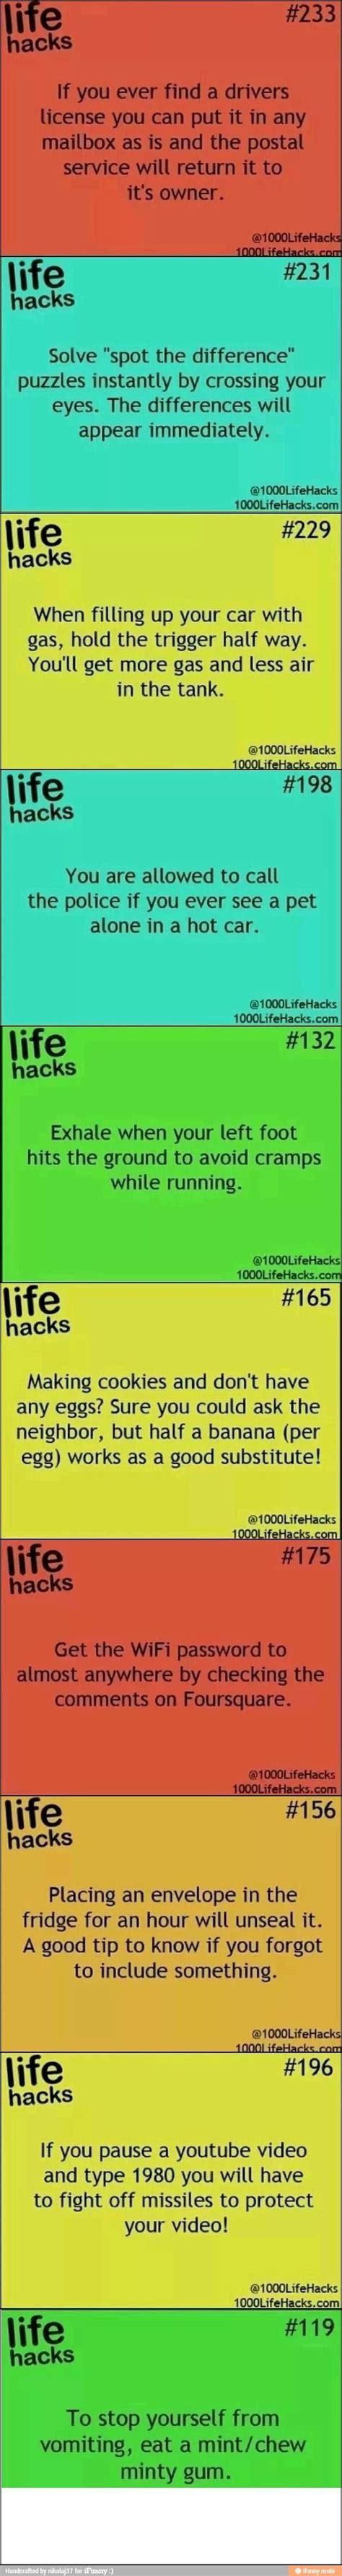 Hacks by Life Hacks Ifunny Life Hacks Pinterest